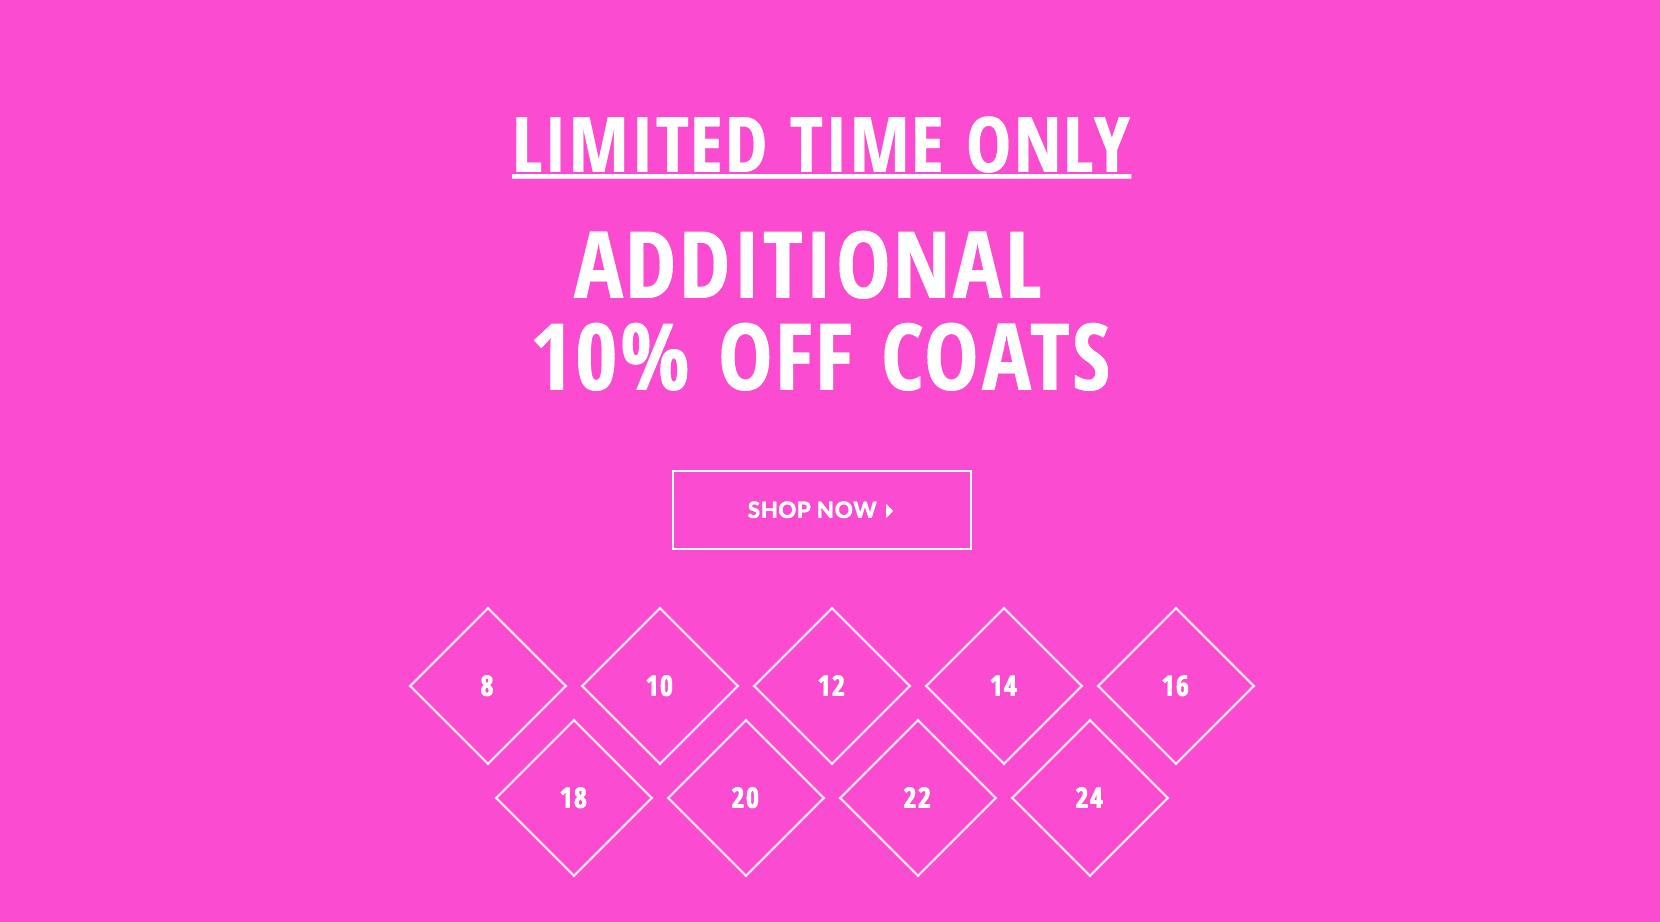 Just Last Season: additional 10% off coats